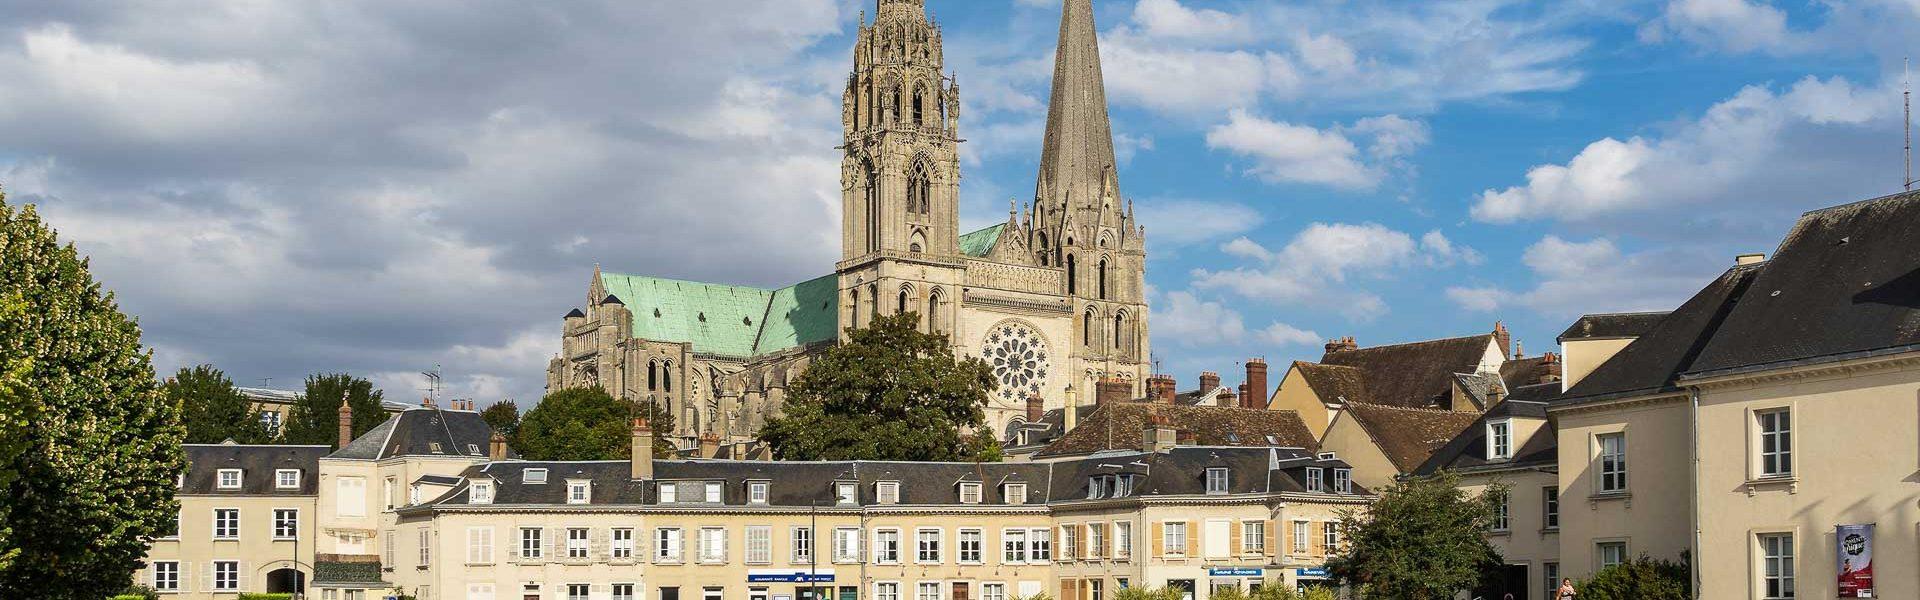 Normandie-Bretagne, Chartres, Kathedrale (Foto: Robert Mrkvicka)